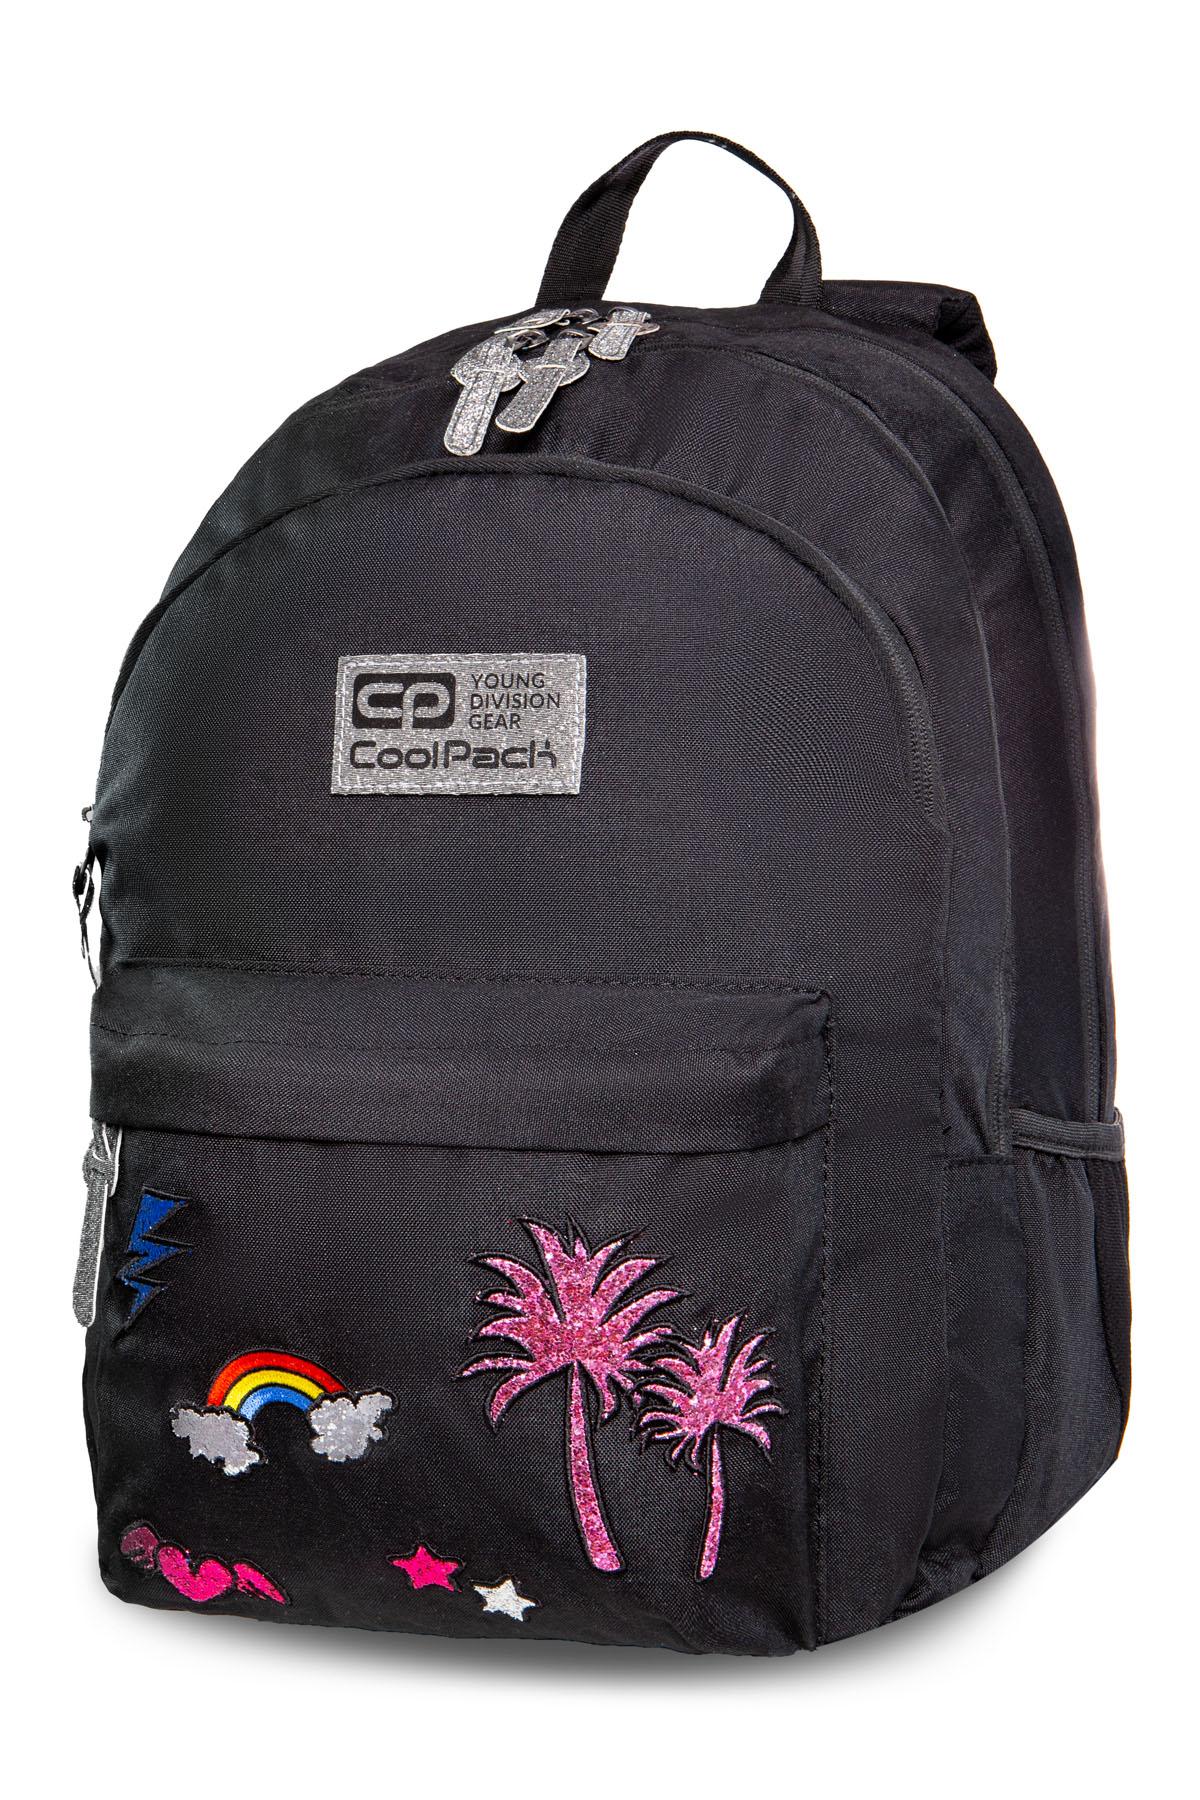 Coolpack - hippie - youth backpack - sparkling badges black